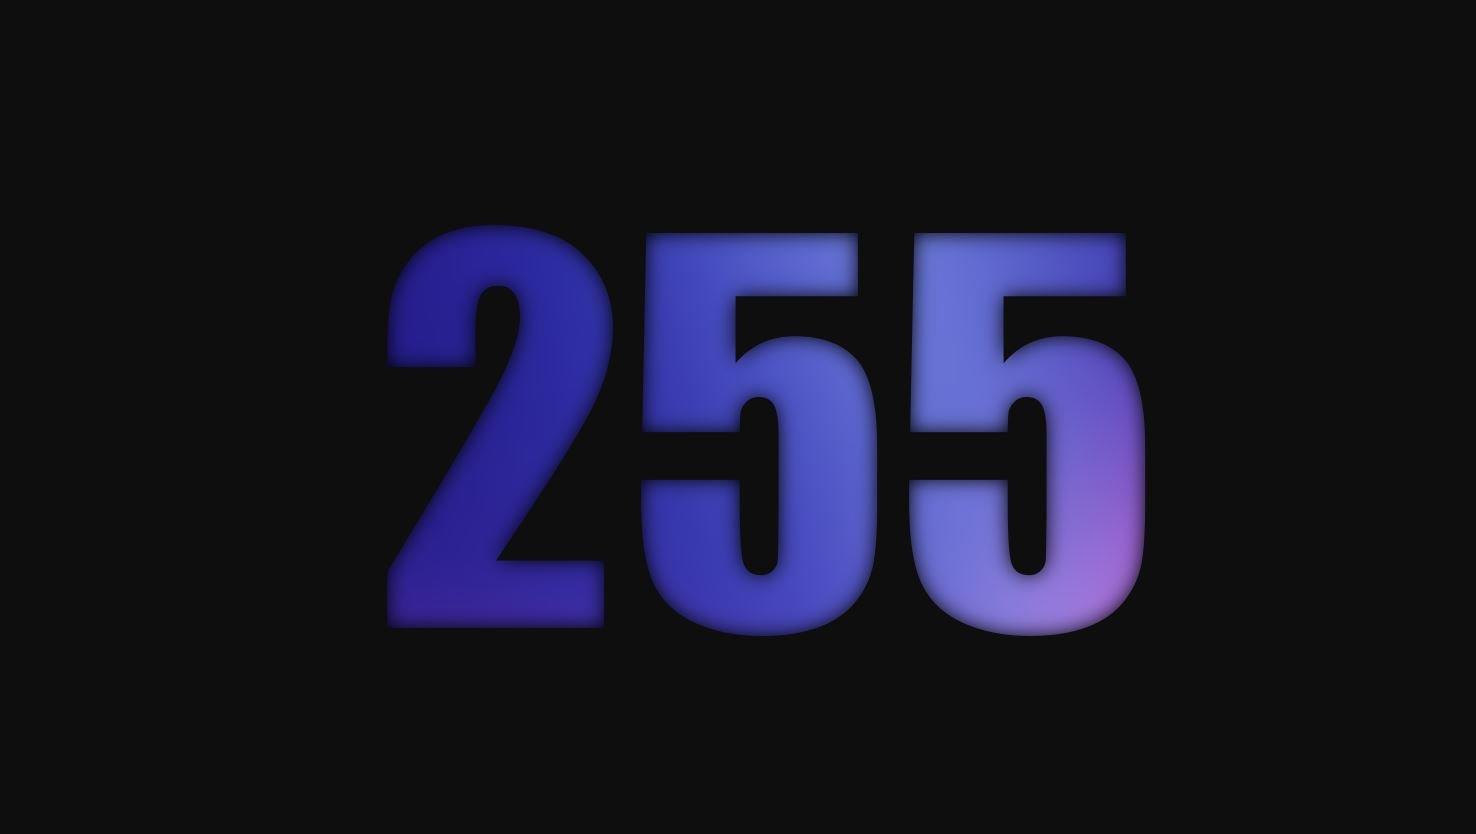 Numerologie 255